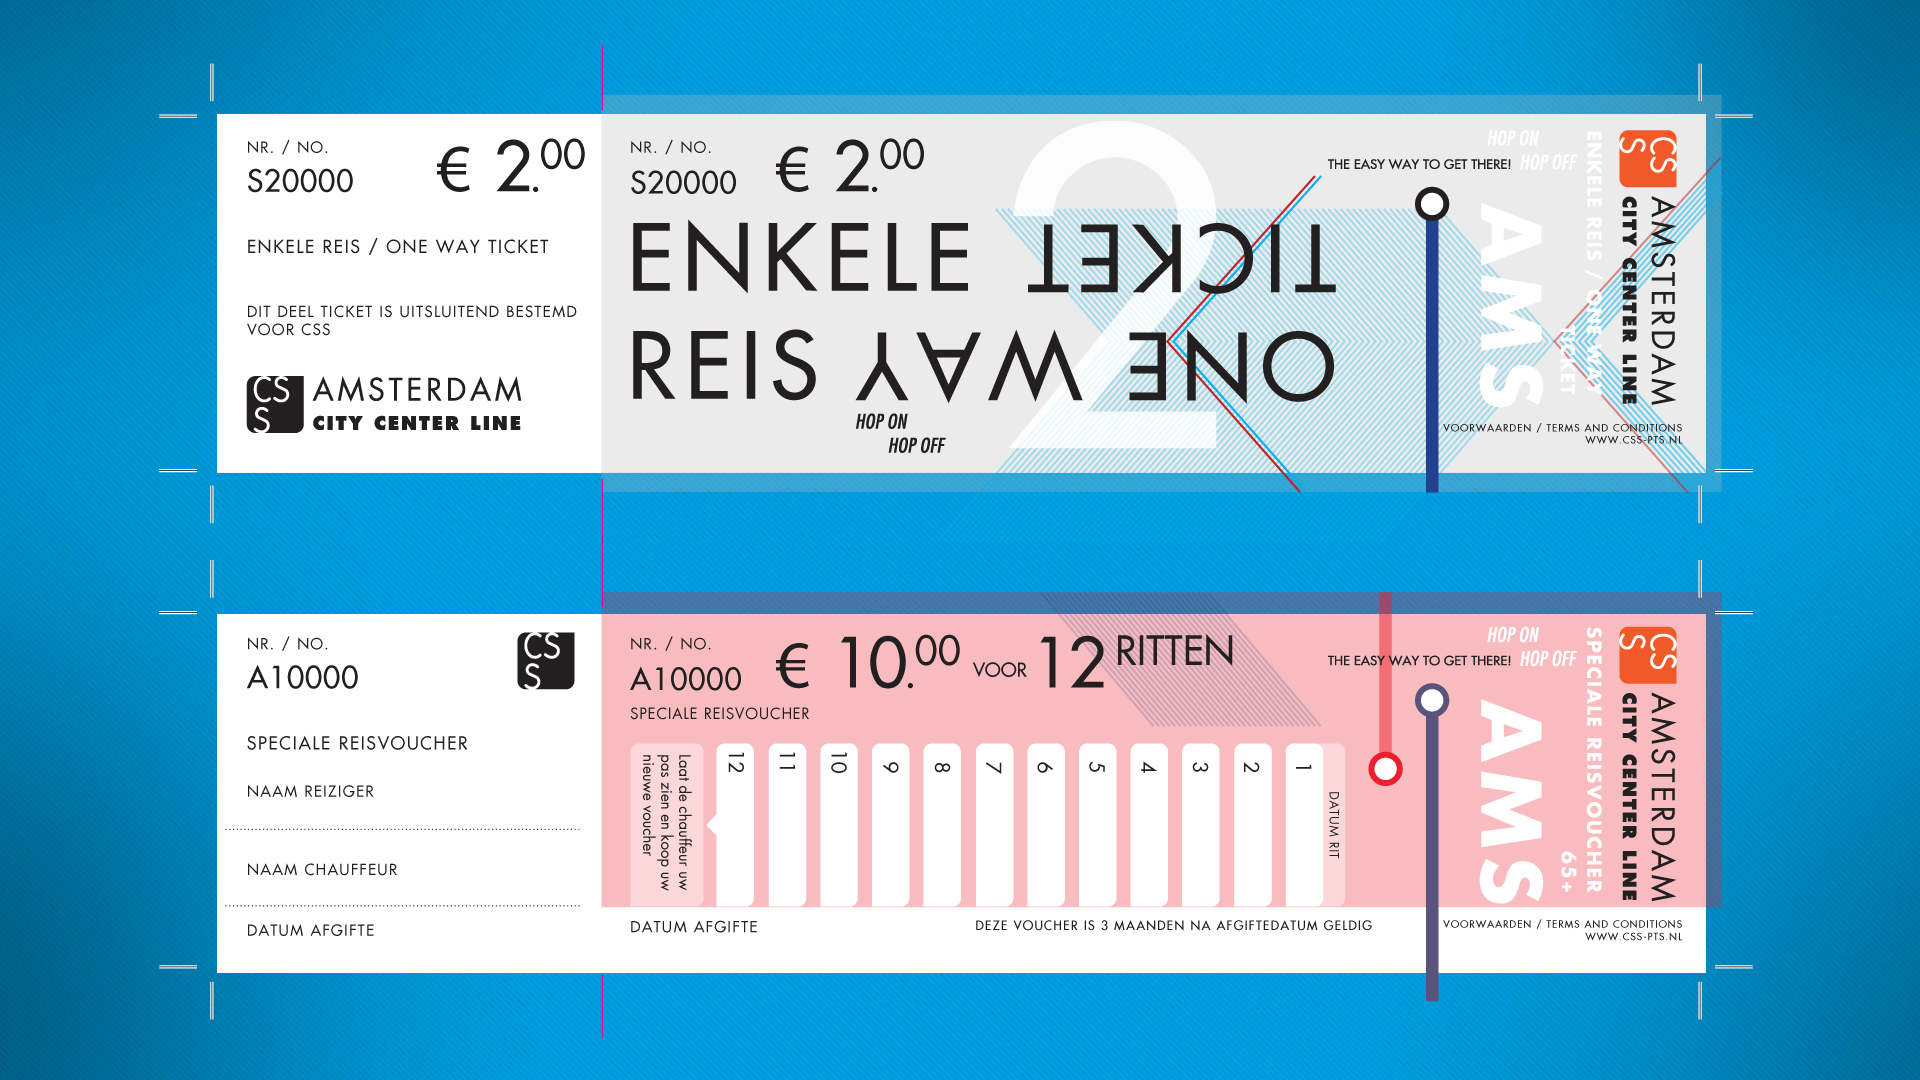 City Center Line Amsterdam. Case. Visuals Art direction, concept, design, creative consultancy. Sham Ramessar